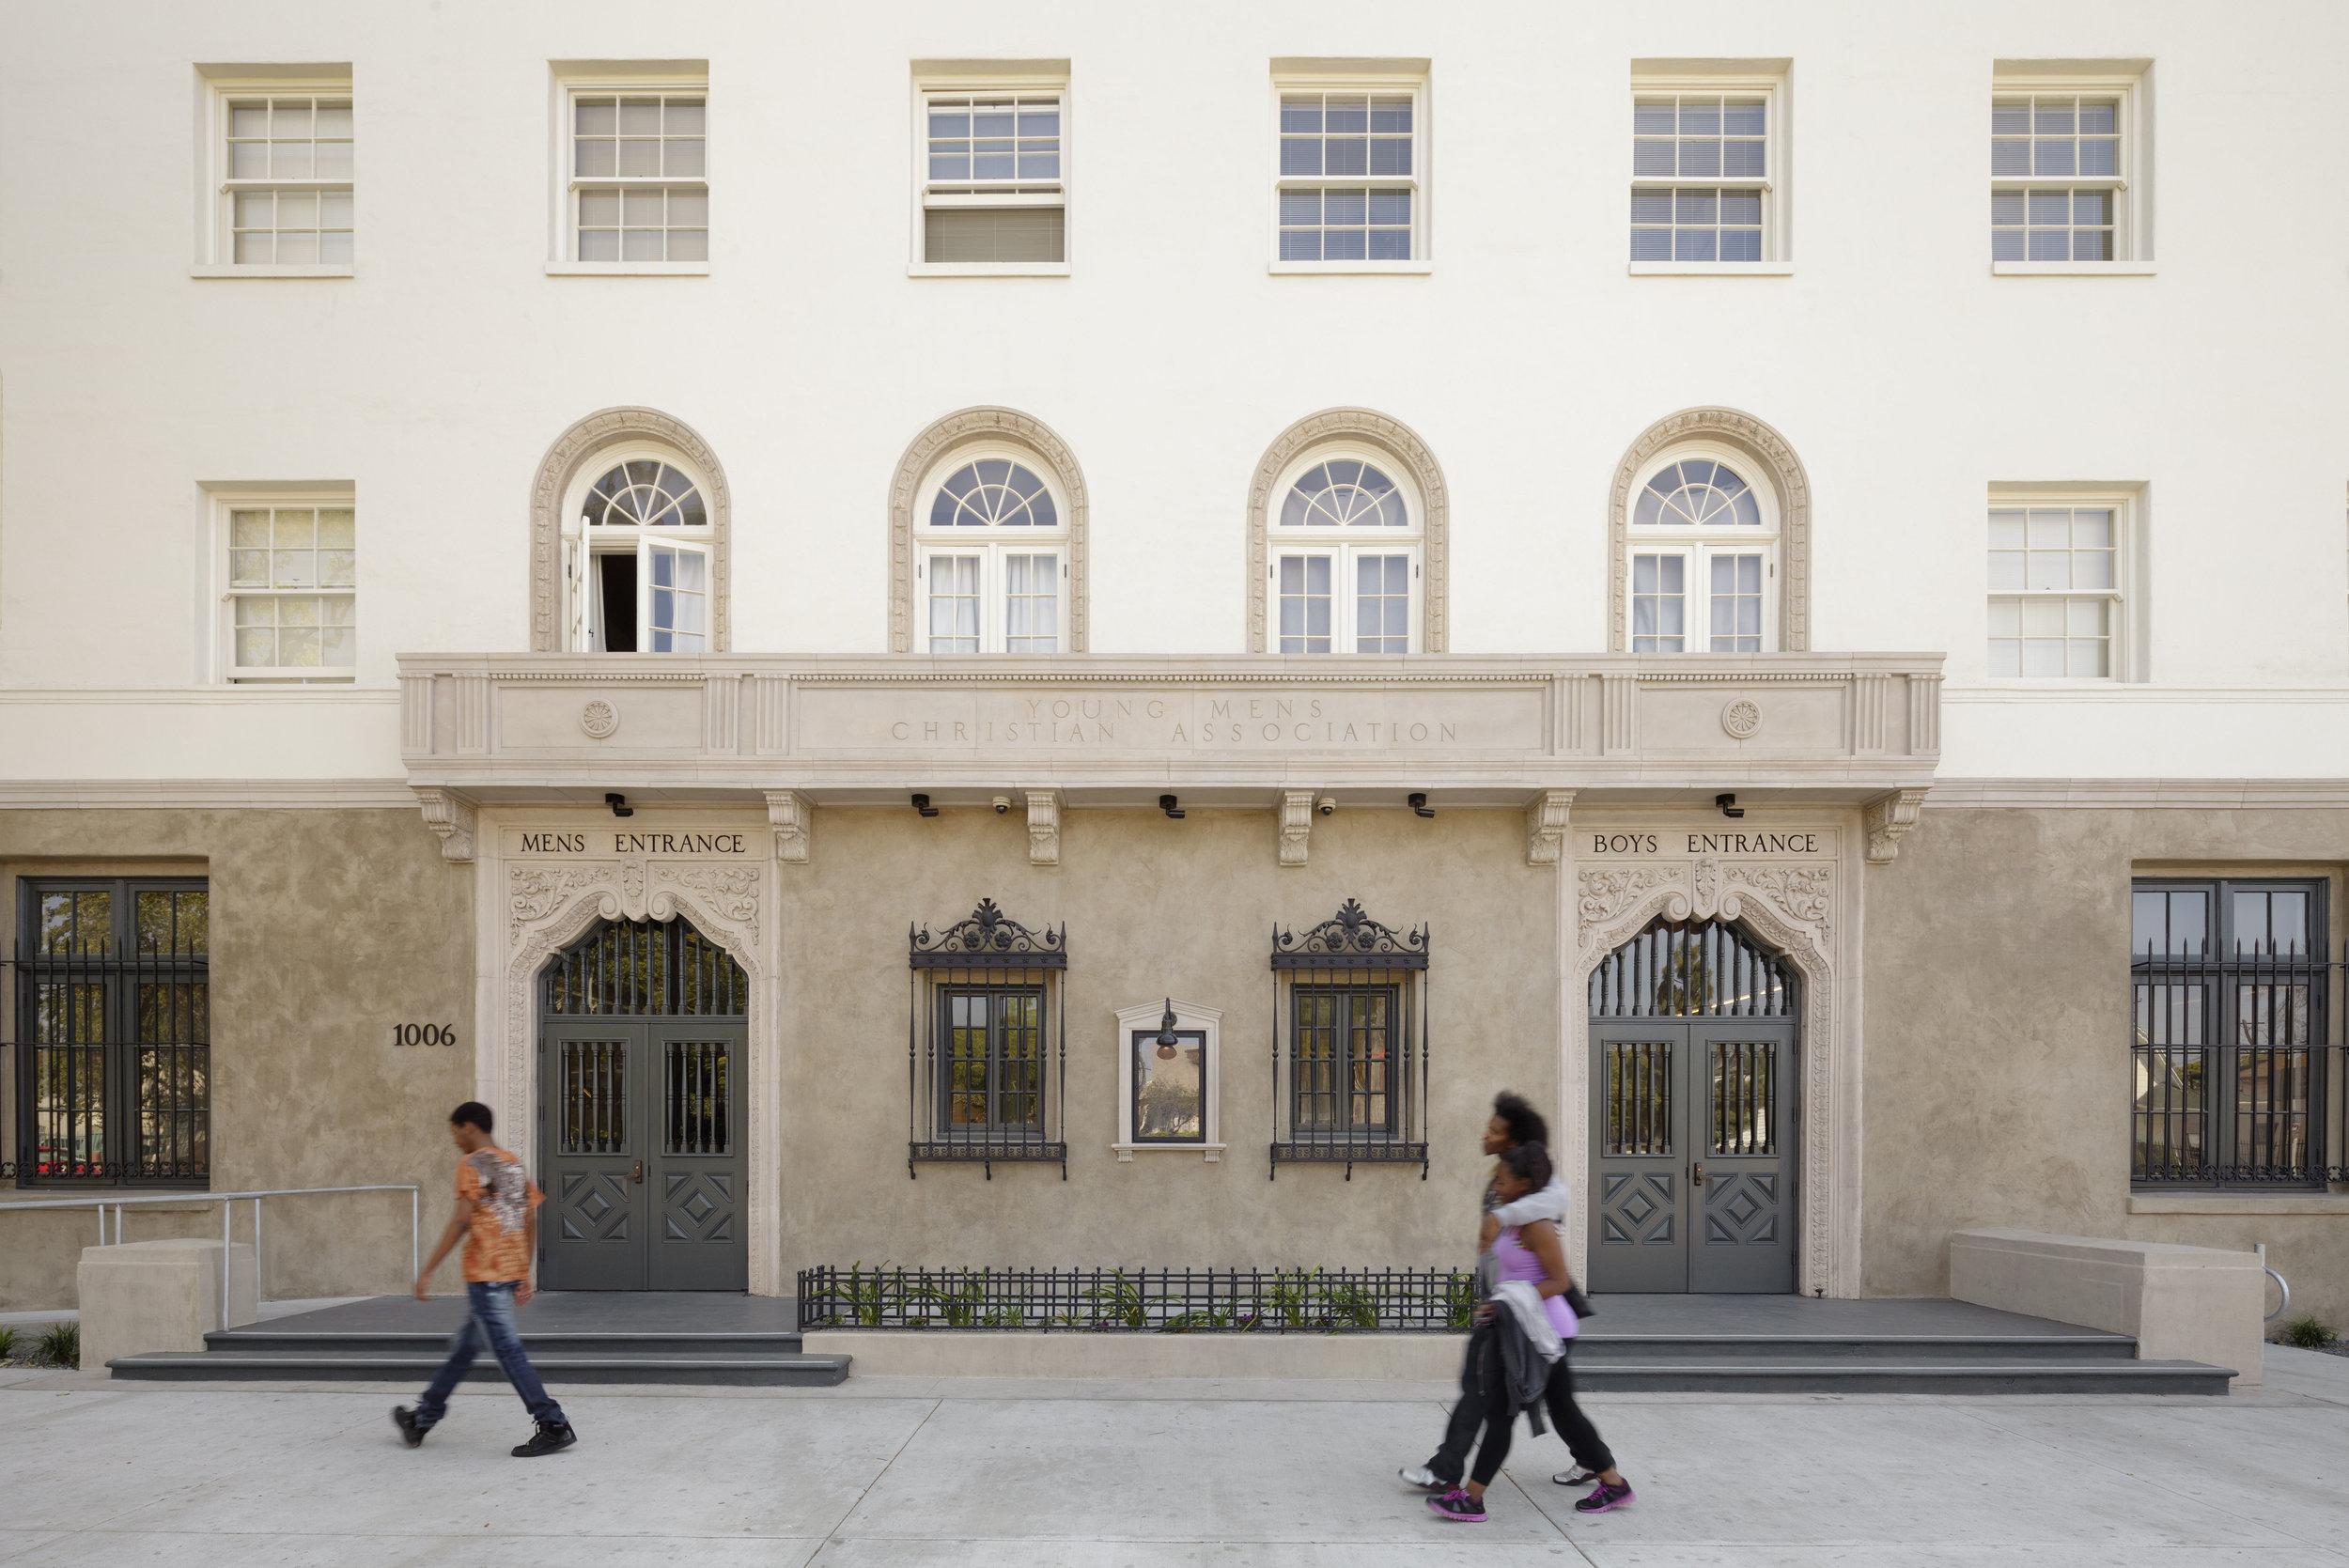 28th Street Apartments - Boys and Girls Entrances - Staudenmaier.jpg